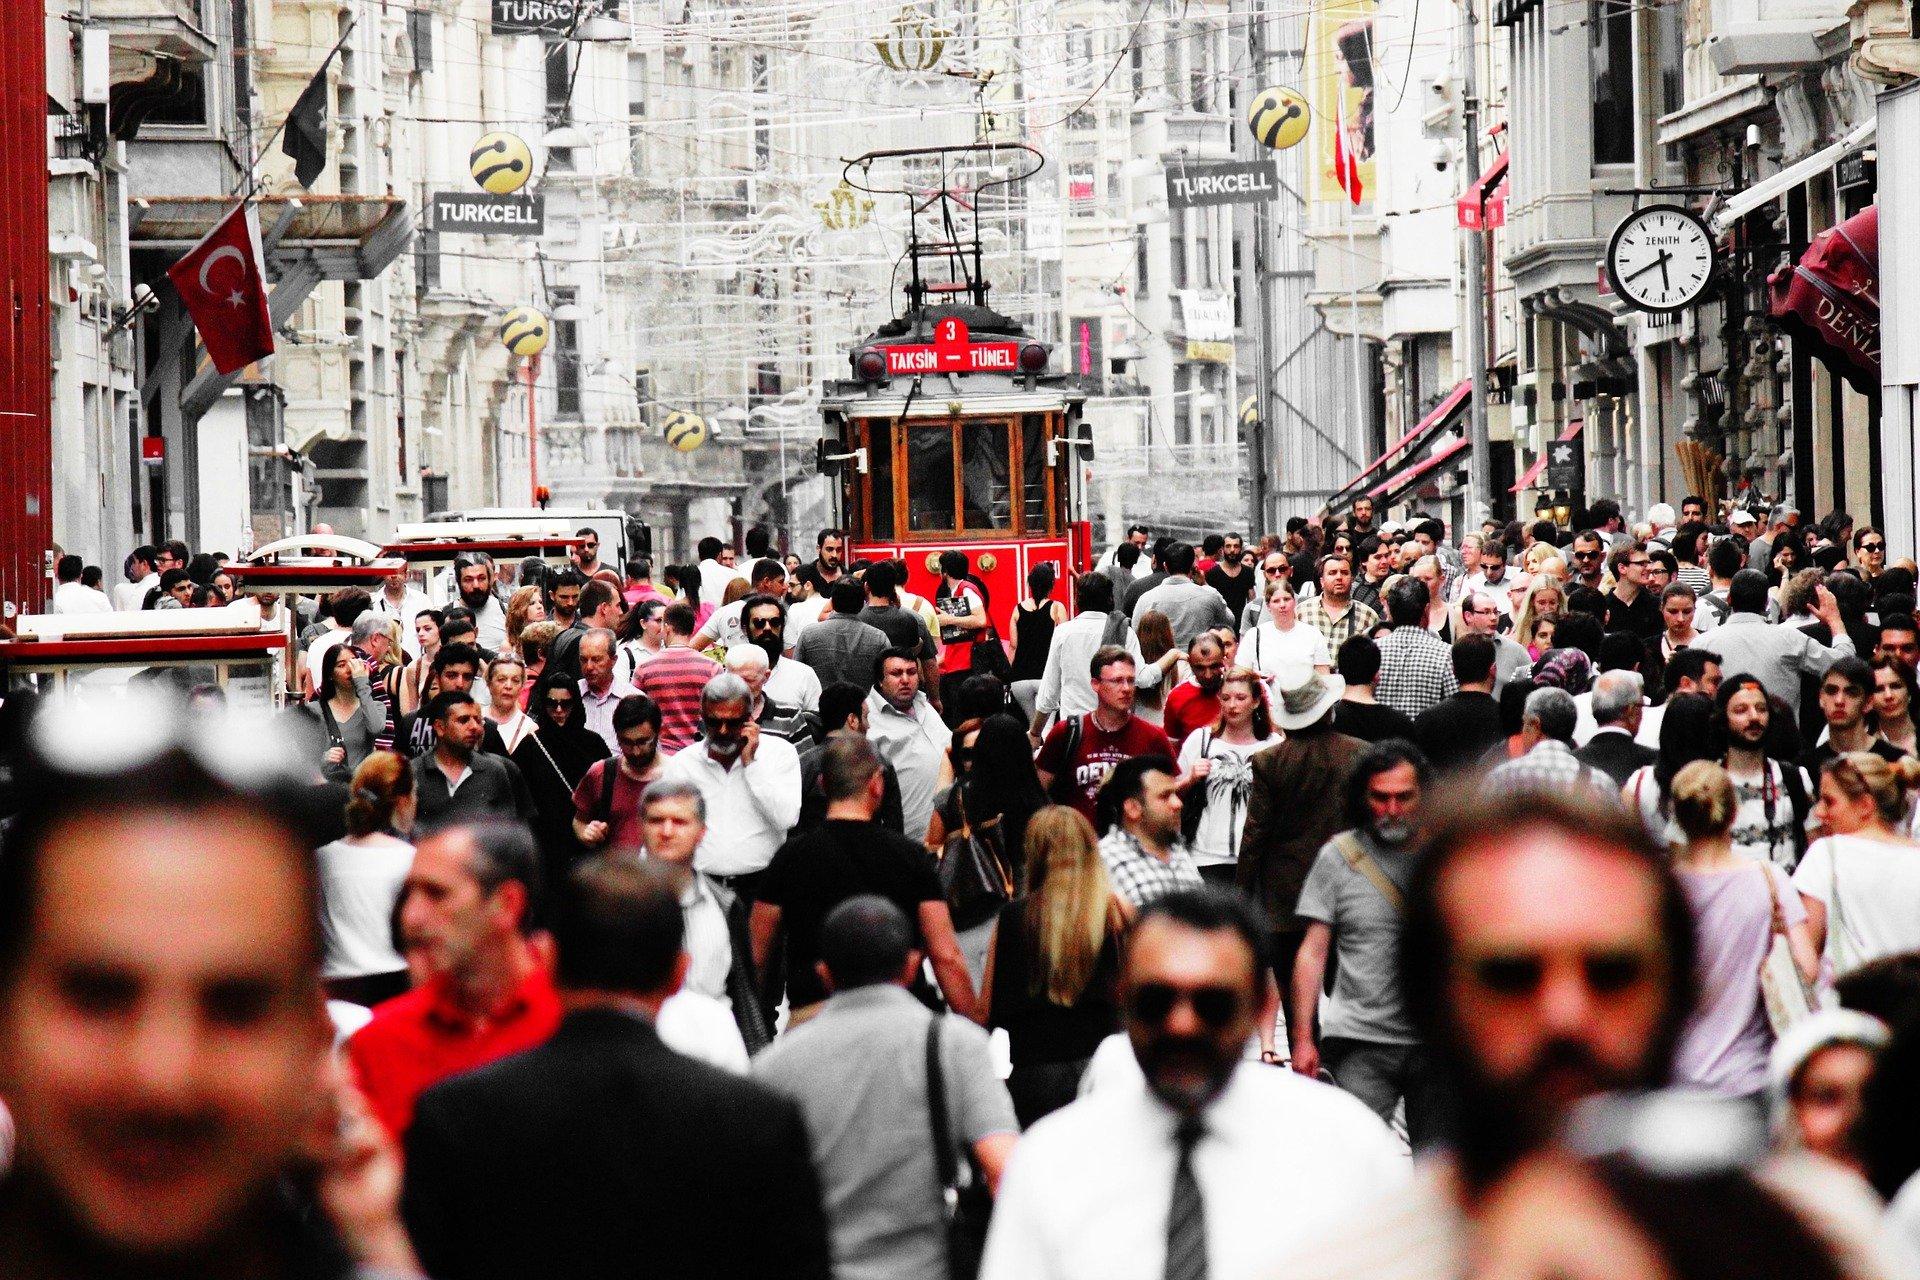 over tourism crowds